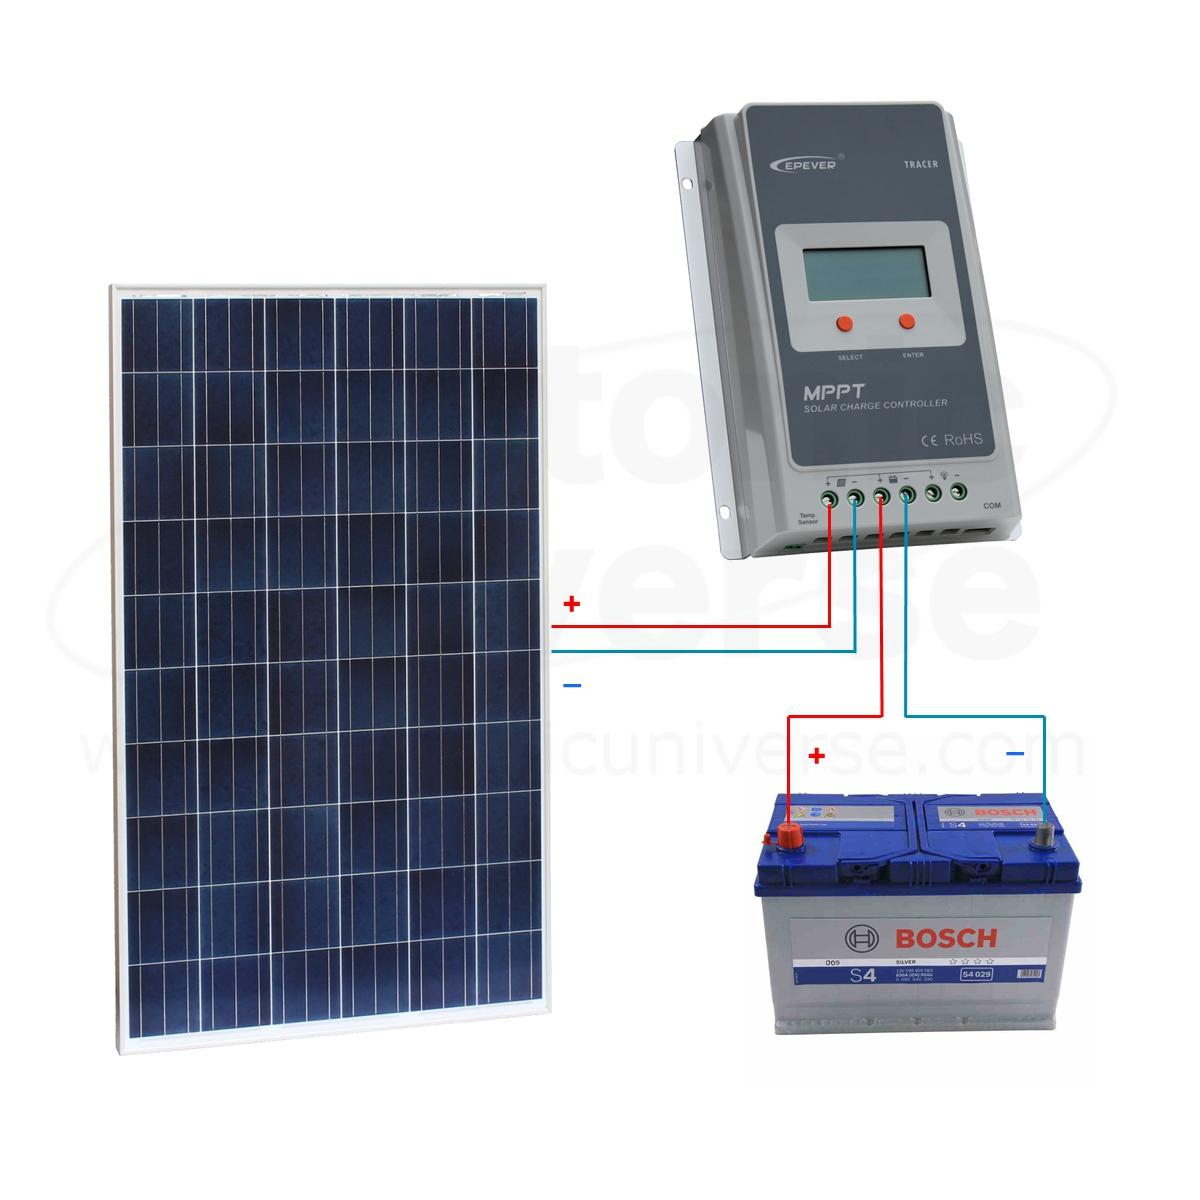 solar panel wiring diagram uk for wall lights 6w white light double cob led switch night 250w 12v 24v charging kit motorhome